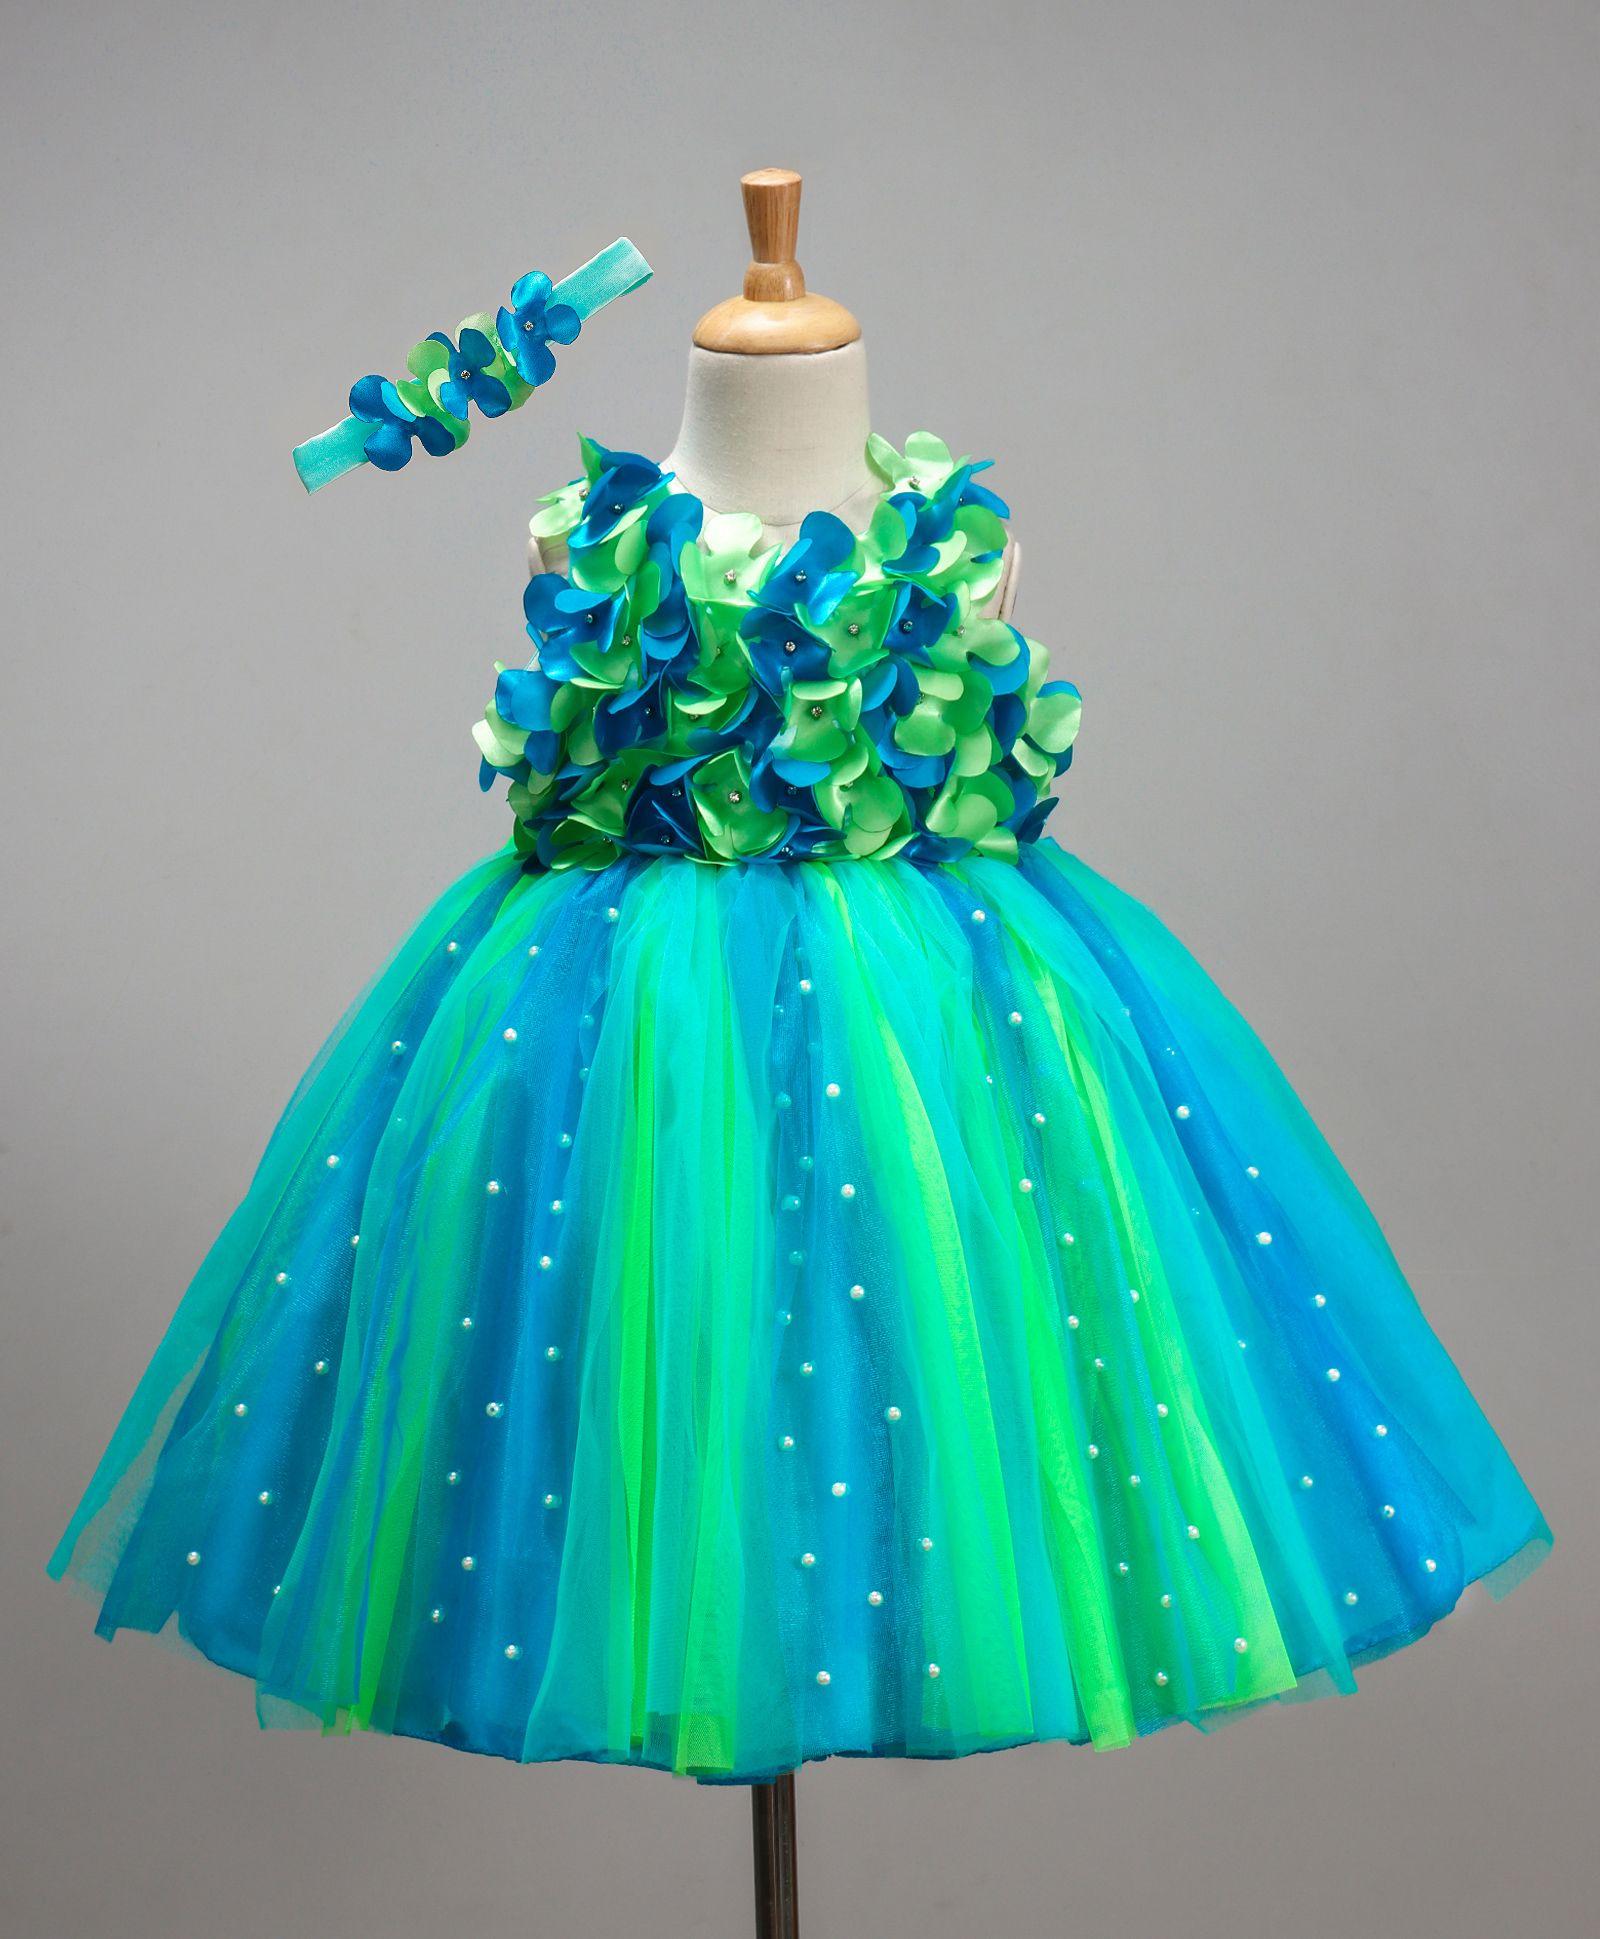 49c807df3 Buy Li&Li Boutique Netted Flower Dress Blue & Green for Girls (0-3 ...